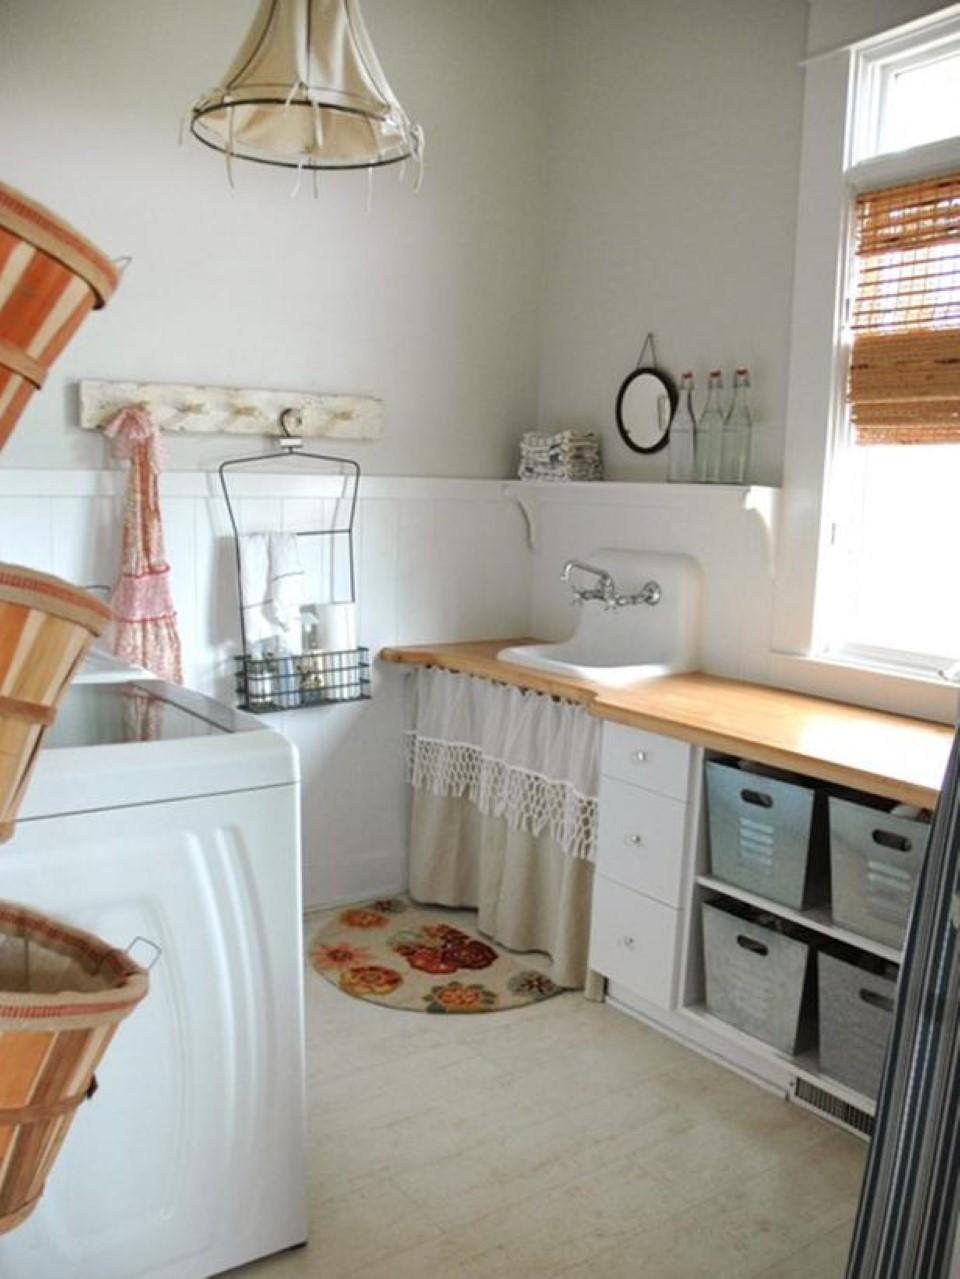 Laundry Basket Shelves: Style of Arrangement - HomesFeed on Laundry Room Shelves Ideas  id=58257